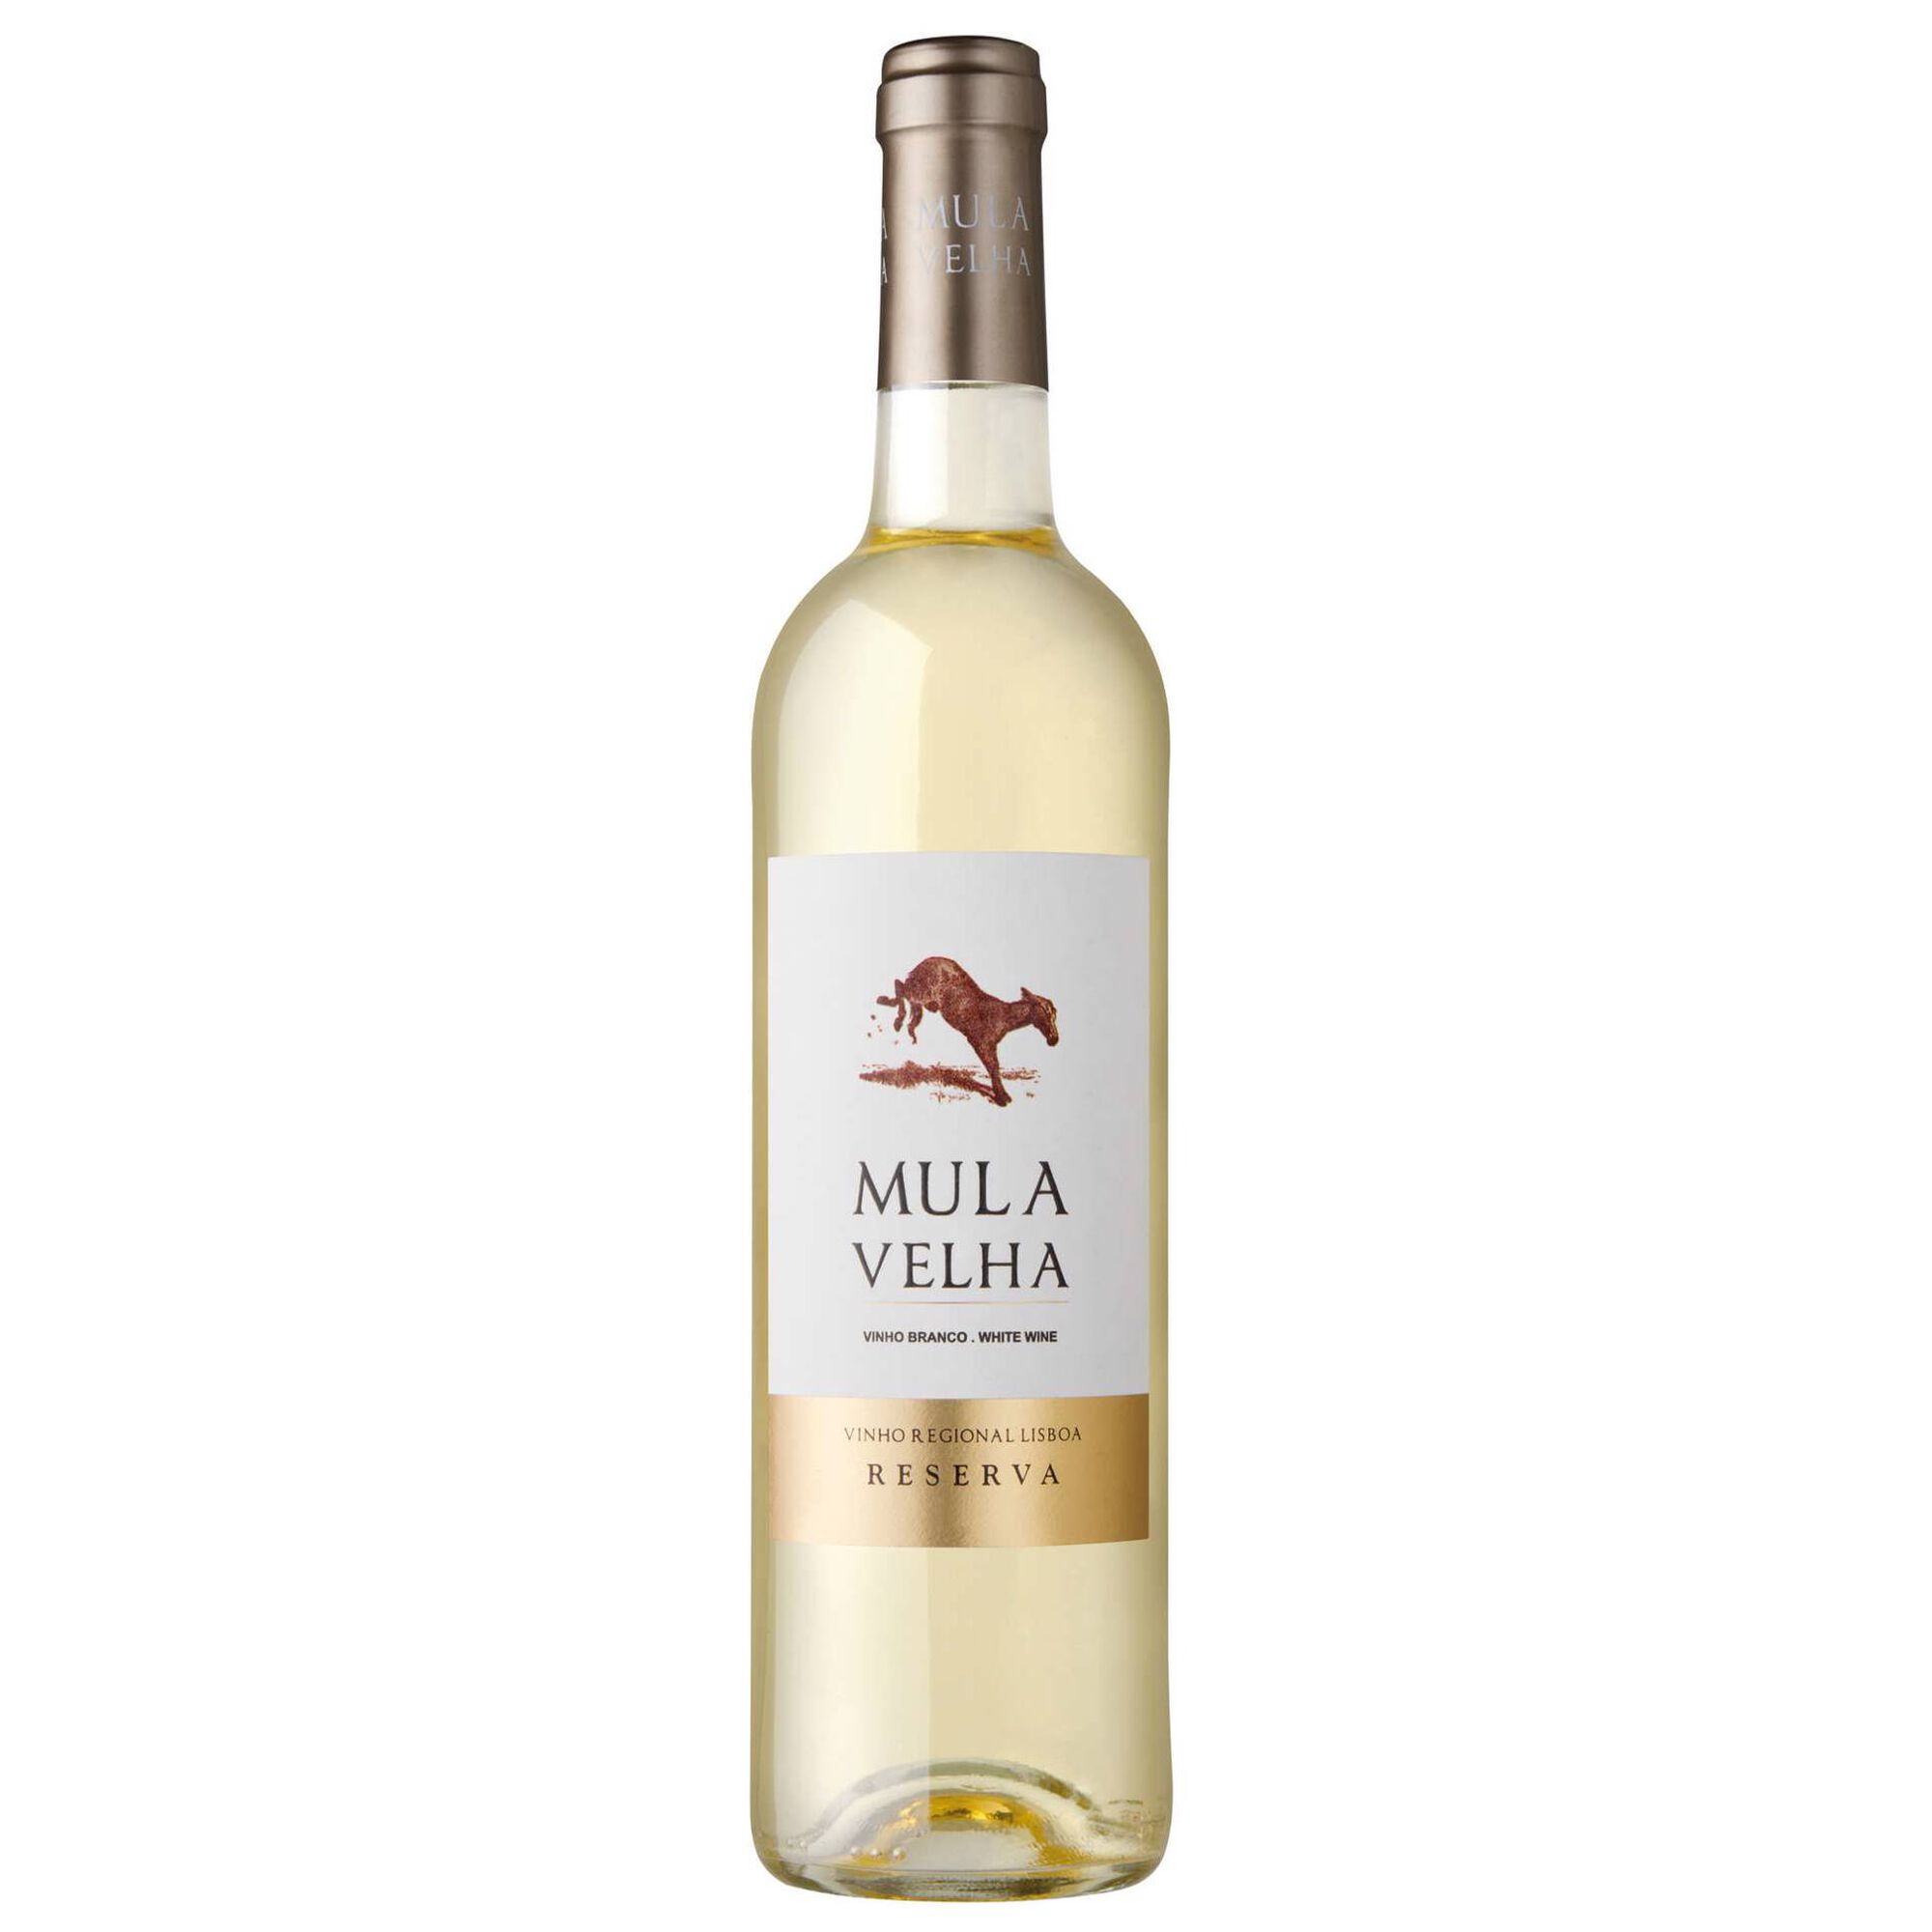 Mula Velha Reserva Regional Lisboa Vinho Branco